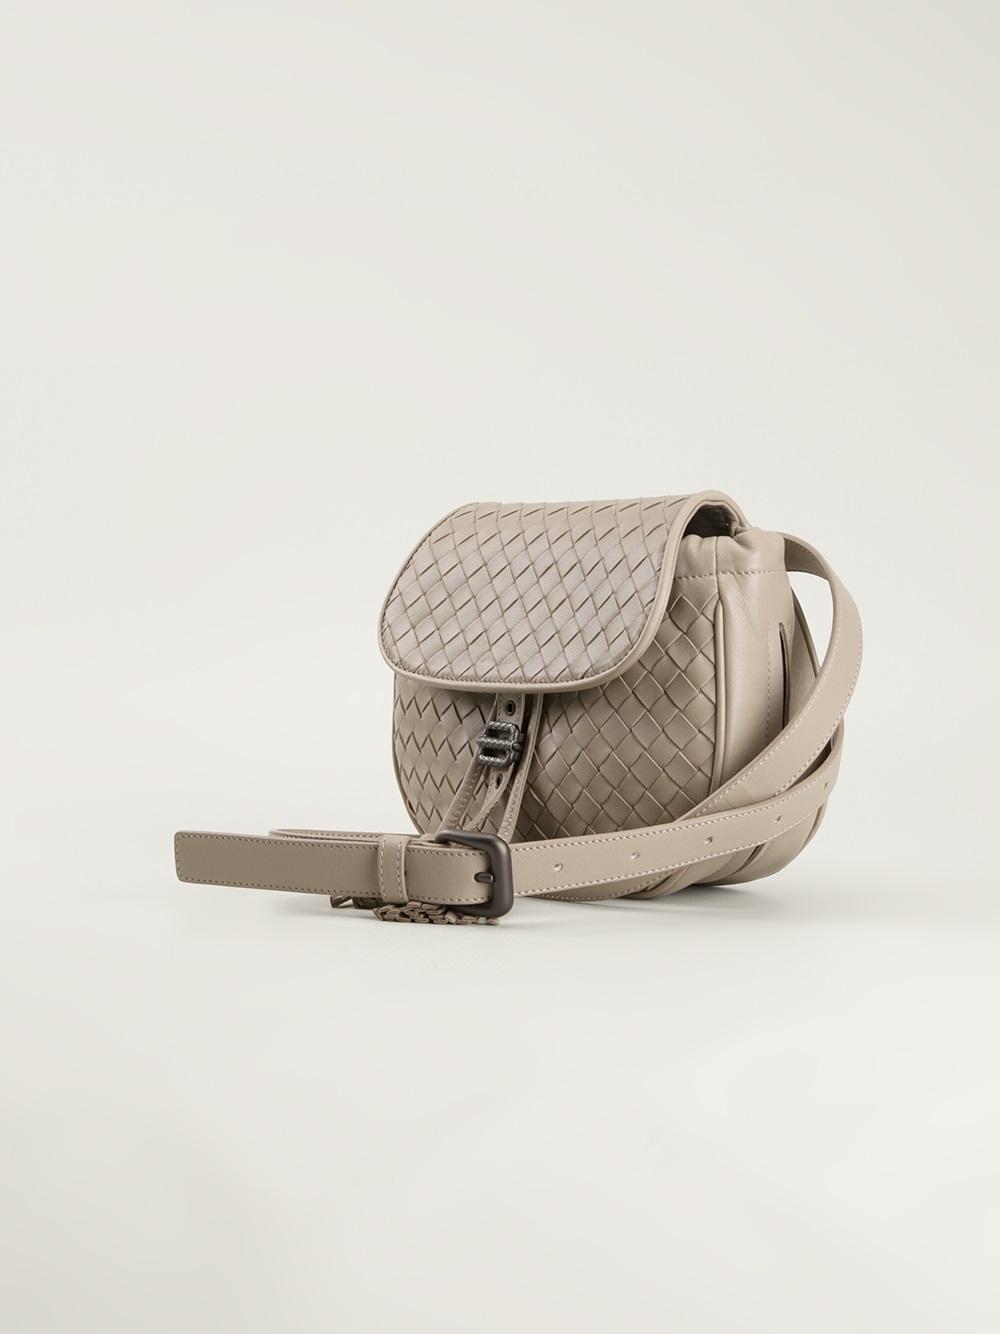 8a2d96c4fbef Bottega Veneta Intrecciato Saddle Bag in Gray - Lyst